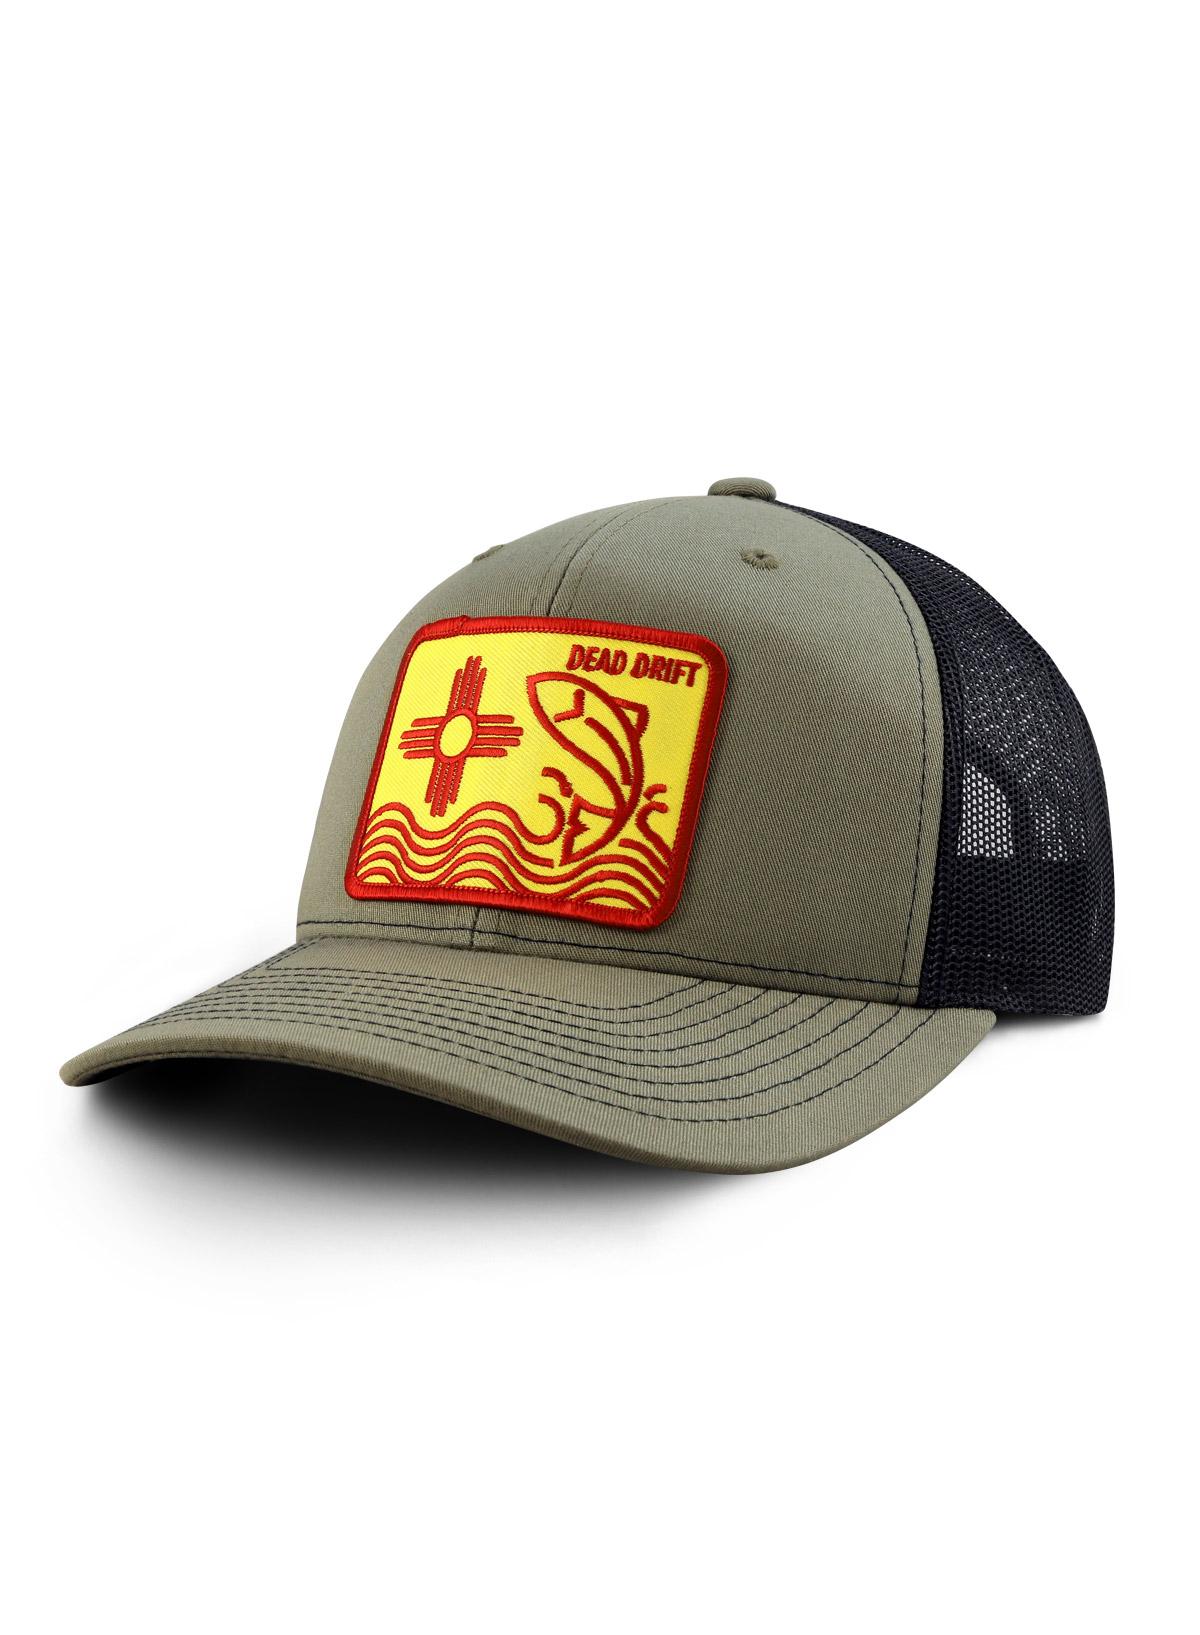 3142d9c6 New Mexico Trucker Hat — Dead Drift